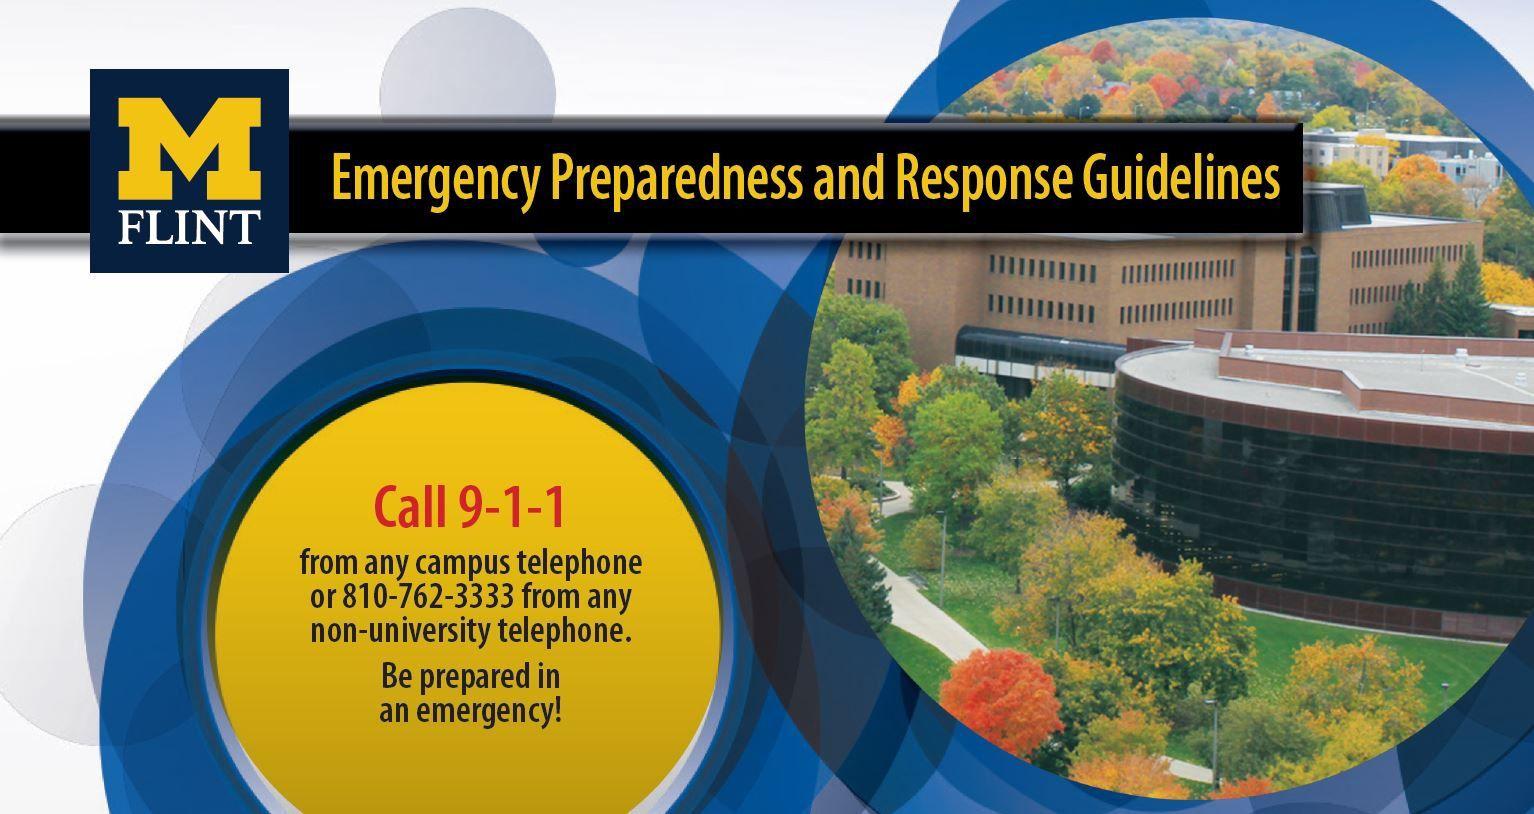 003 Impressive School Emergency Operation Plan Template Michigan Concept Full